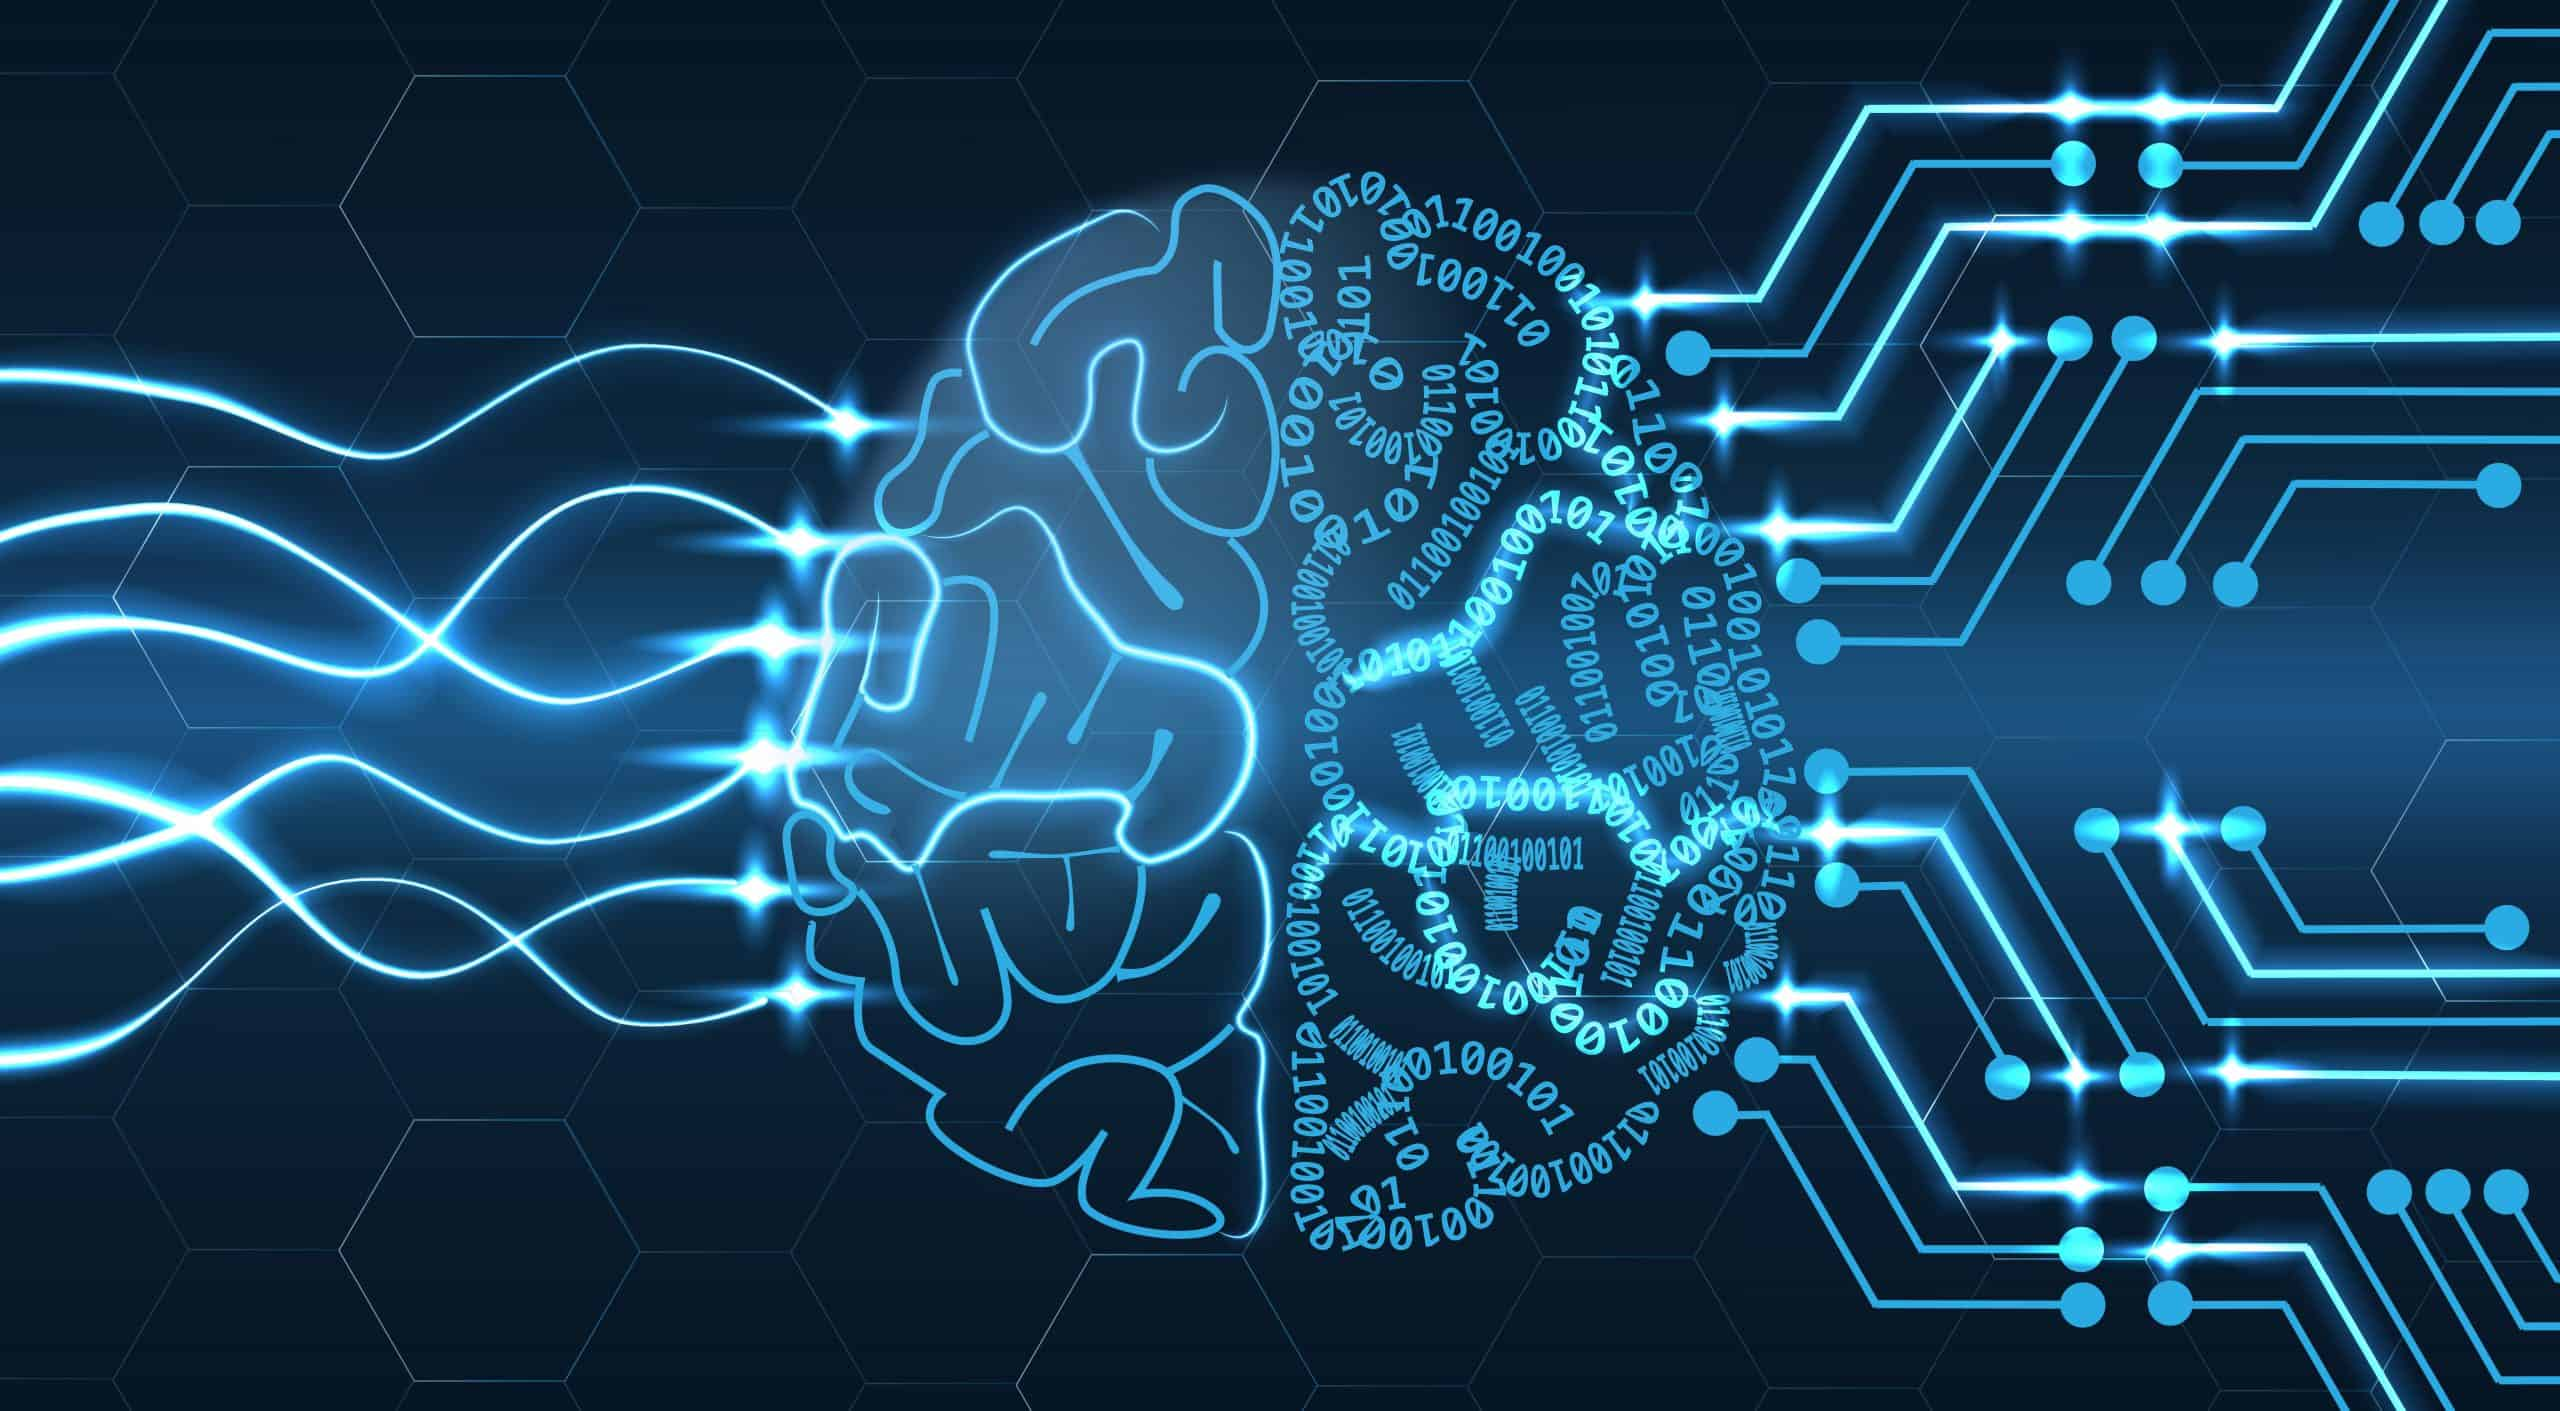 Blue Turtle Technologies, South Africa's leading enterprise technology management company